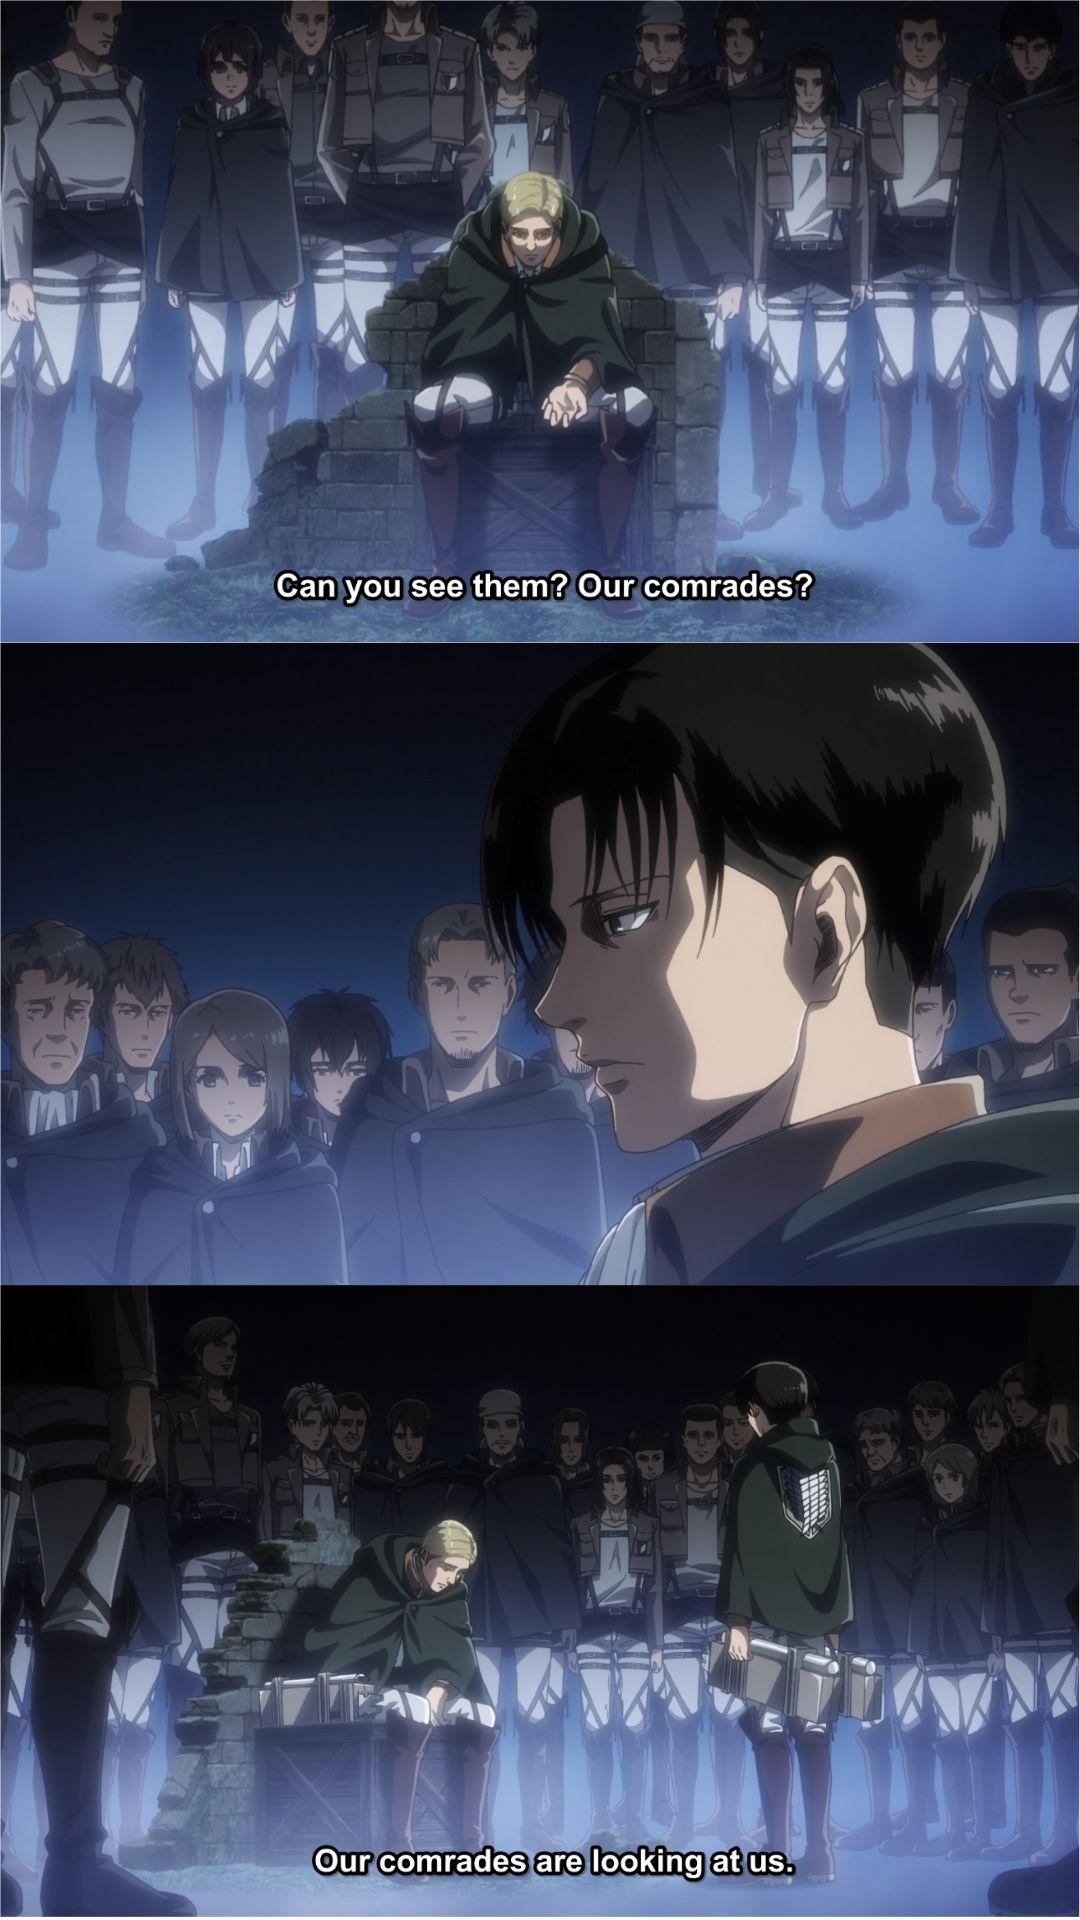 Erwin And Levi Attack On Titan Shingeki No Kyojin Season 3 Episode 16 Snk Shin Attack On Titan Fanart Attack On Titan Season Attack On Titan Aesthetic